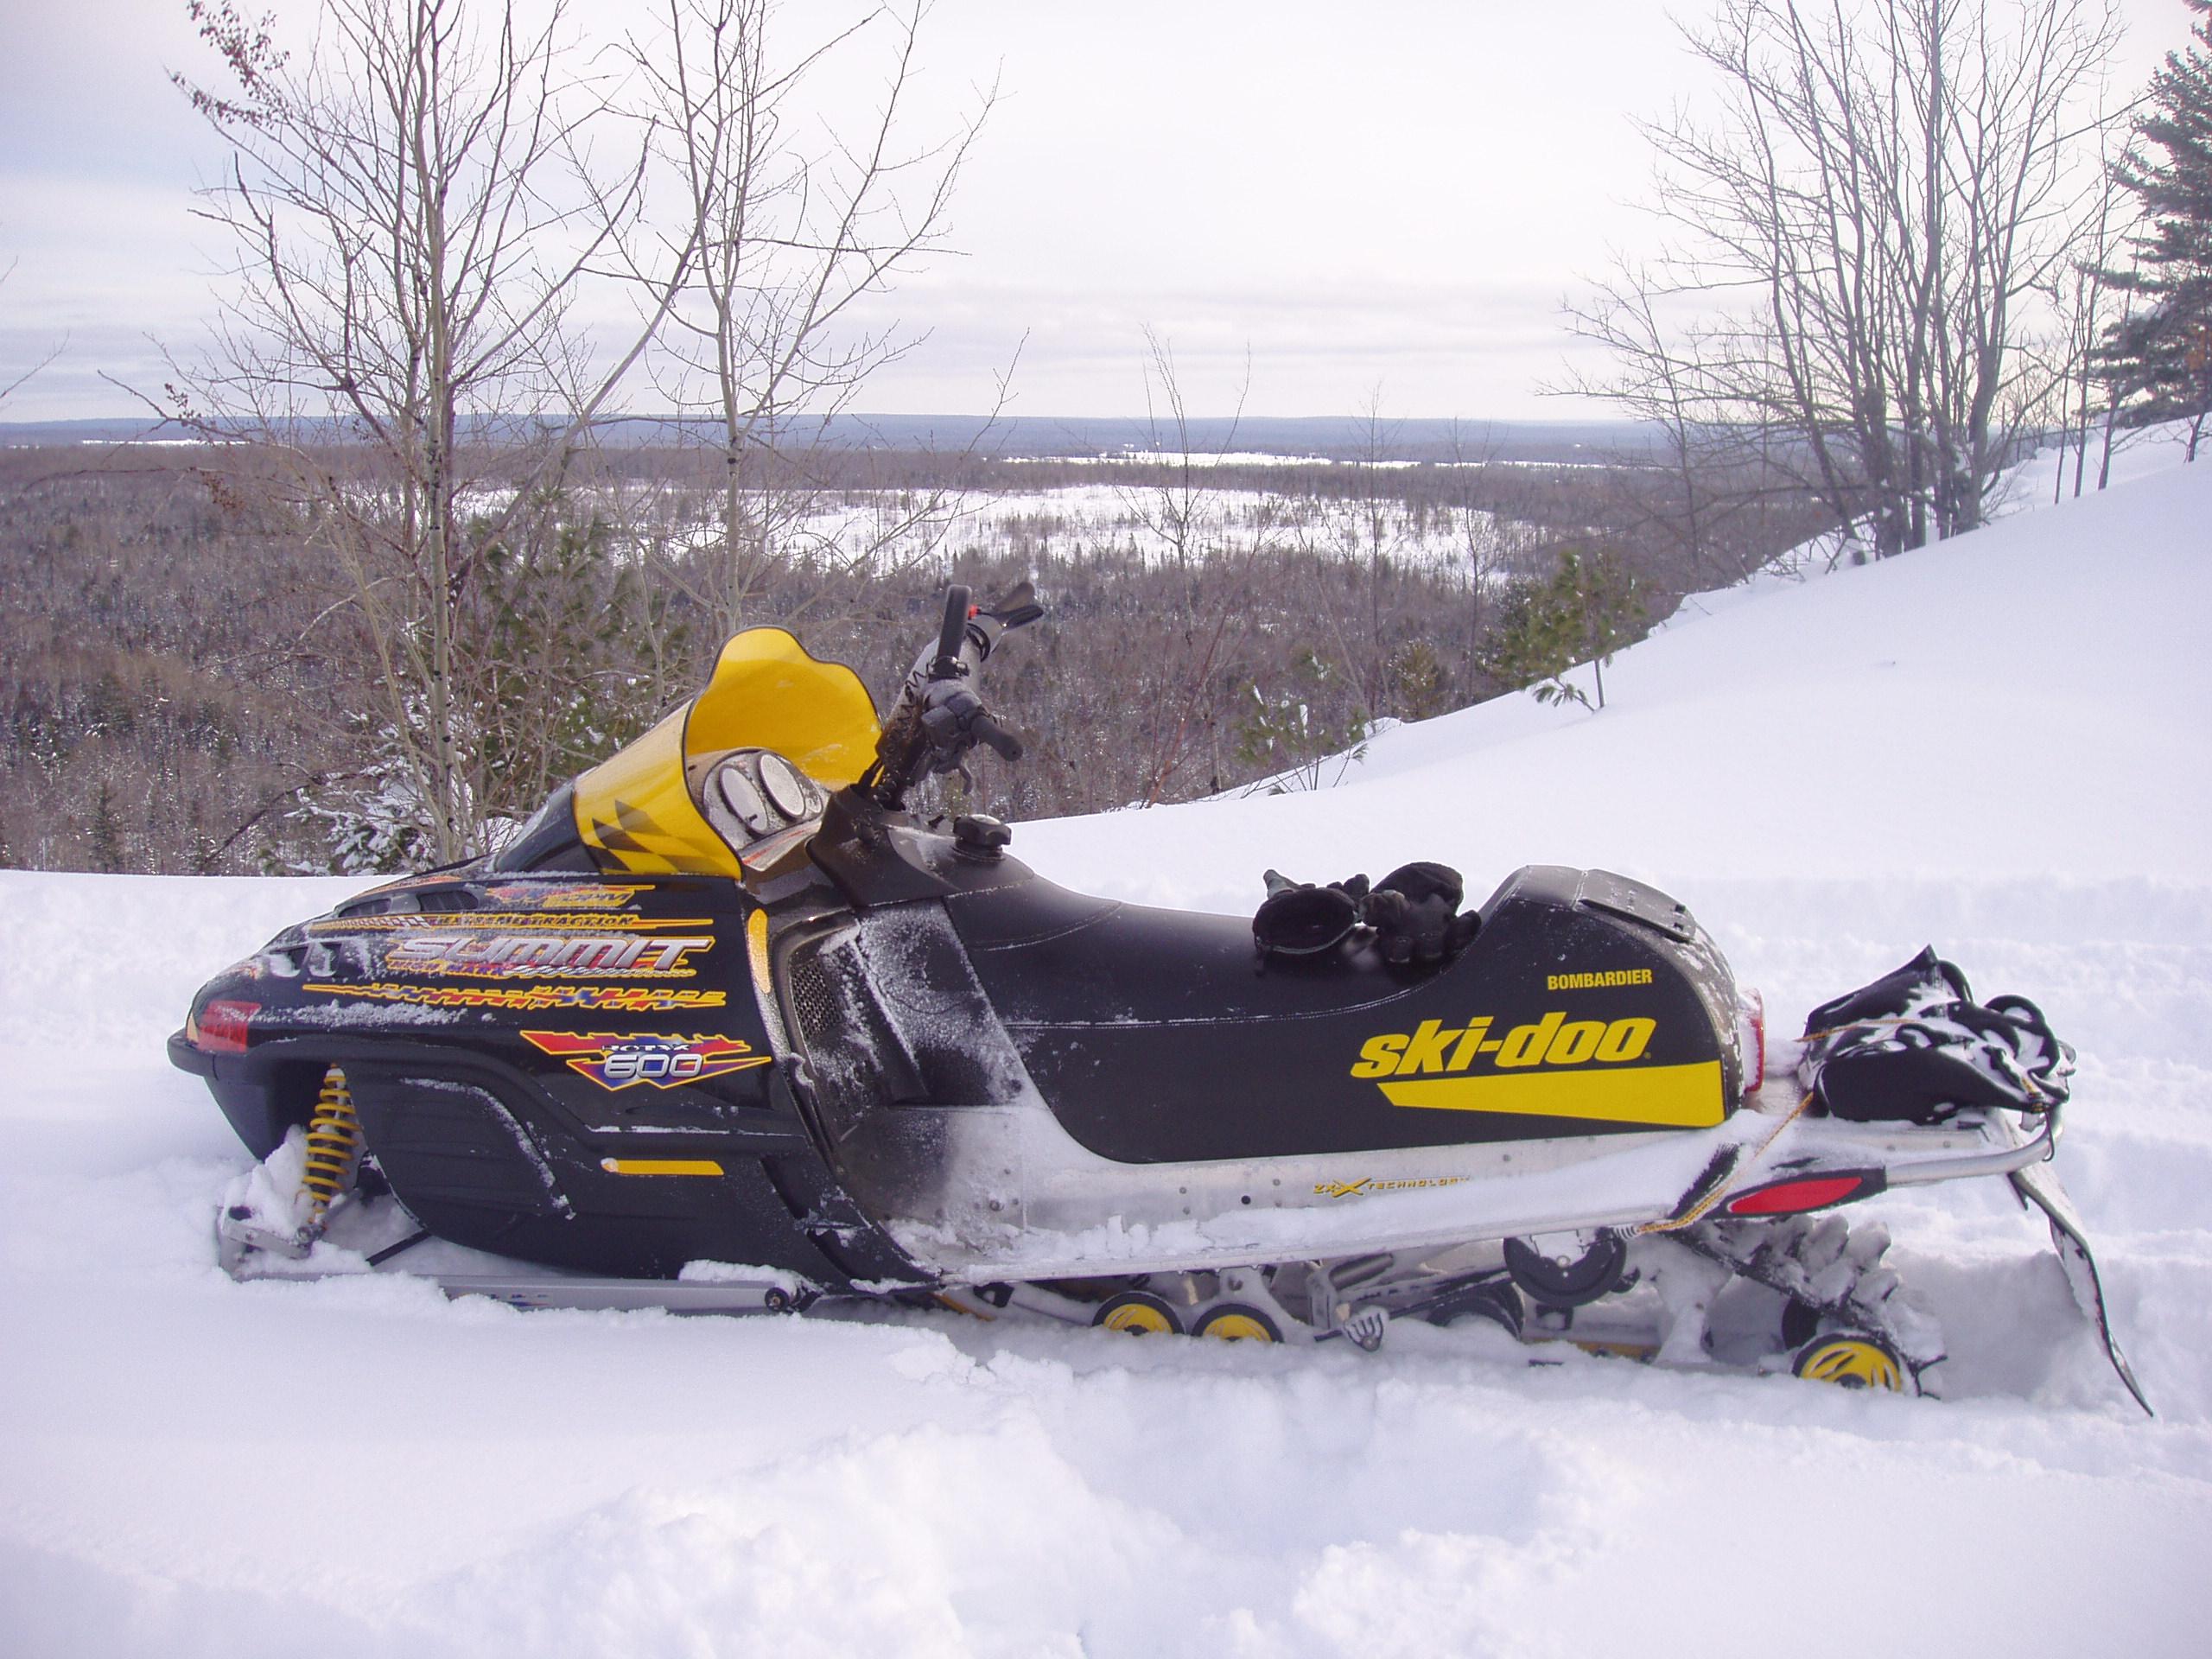 summit 2002 600 skidoo 800 144 doo ski horsepower attachment mountain sleds powder everyone cadillac thread snowmobilefanatics forums